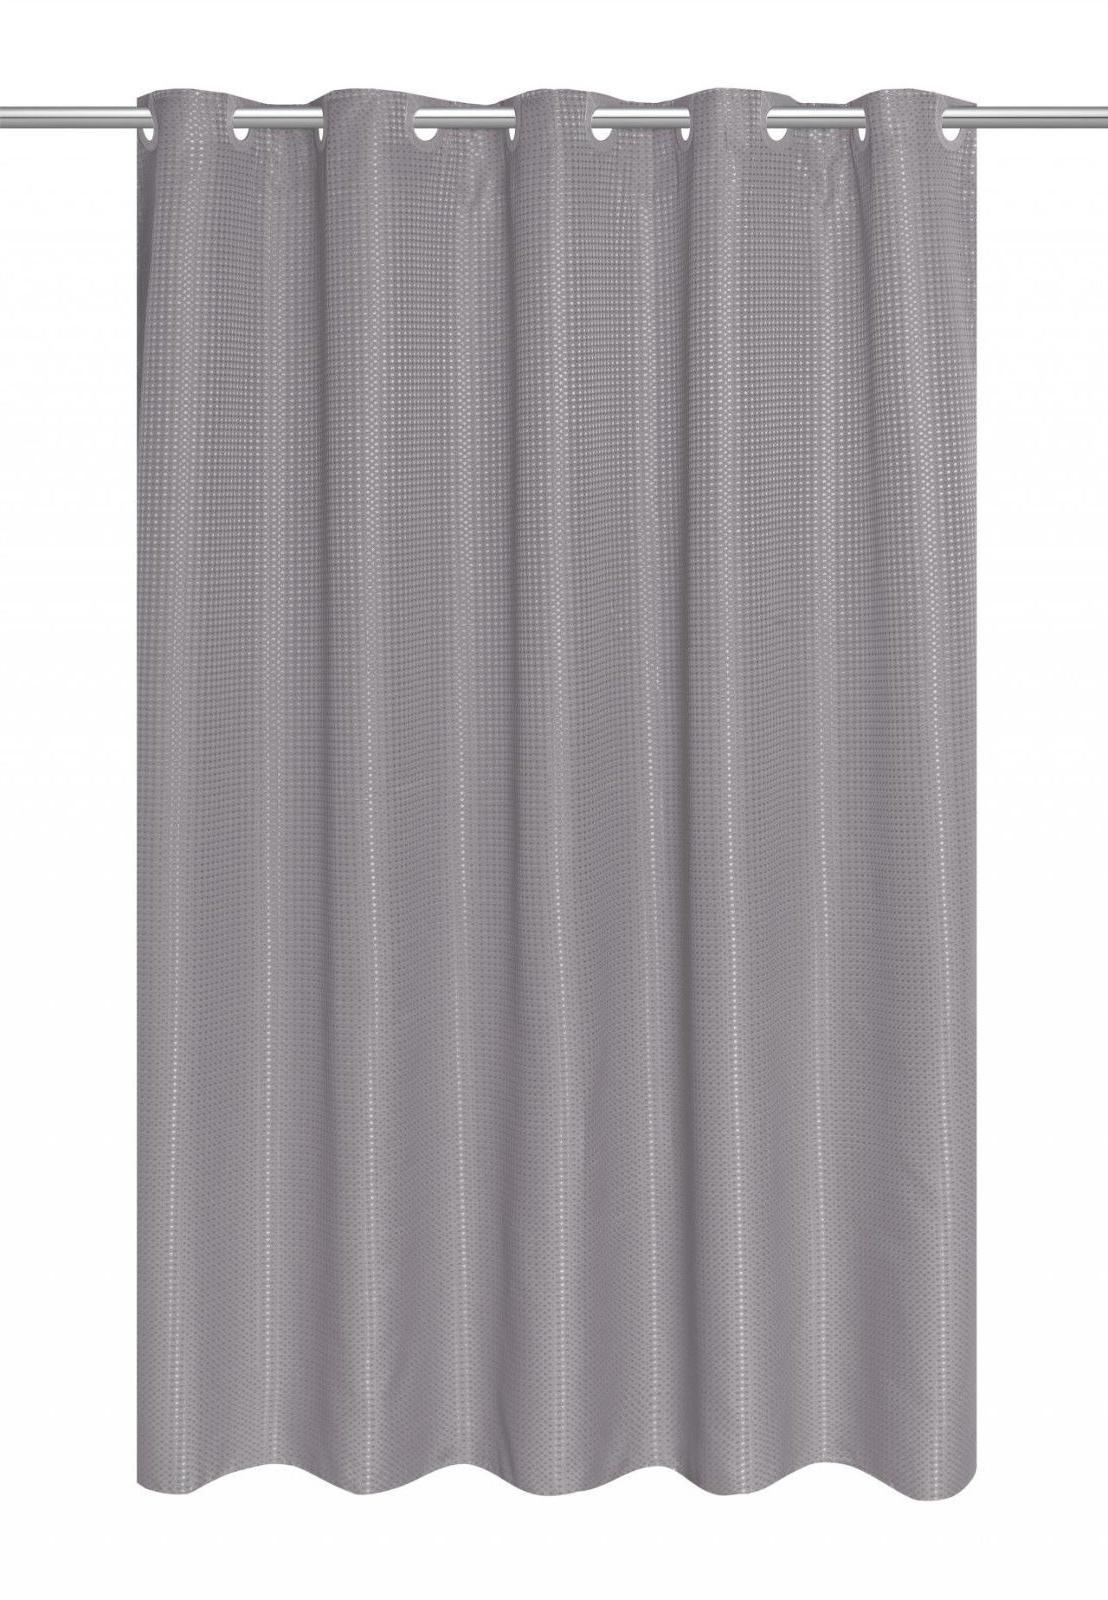 EZ-ON Hookless Heavy Fabric Shower